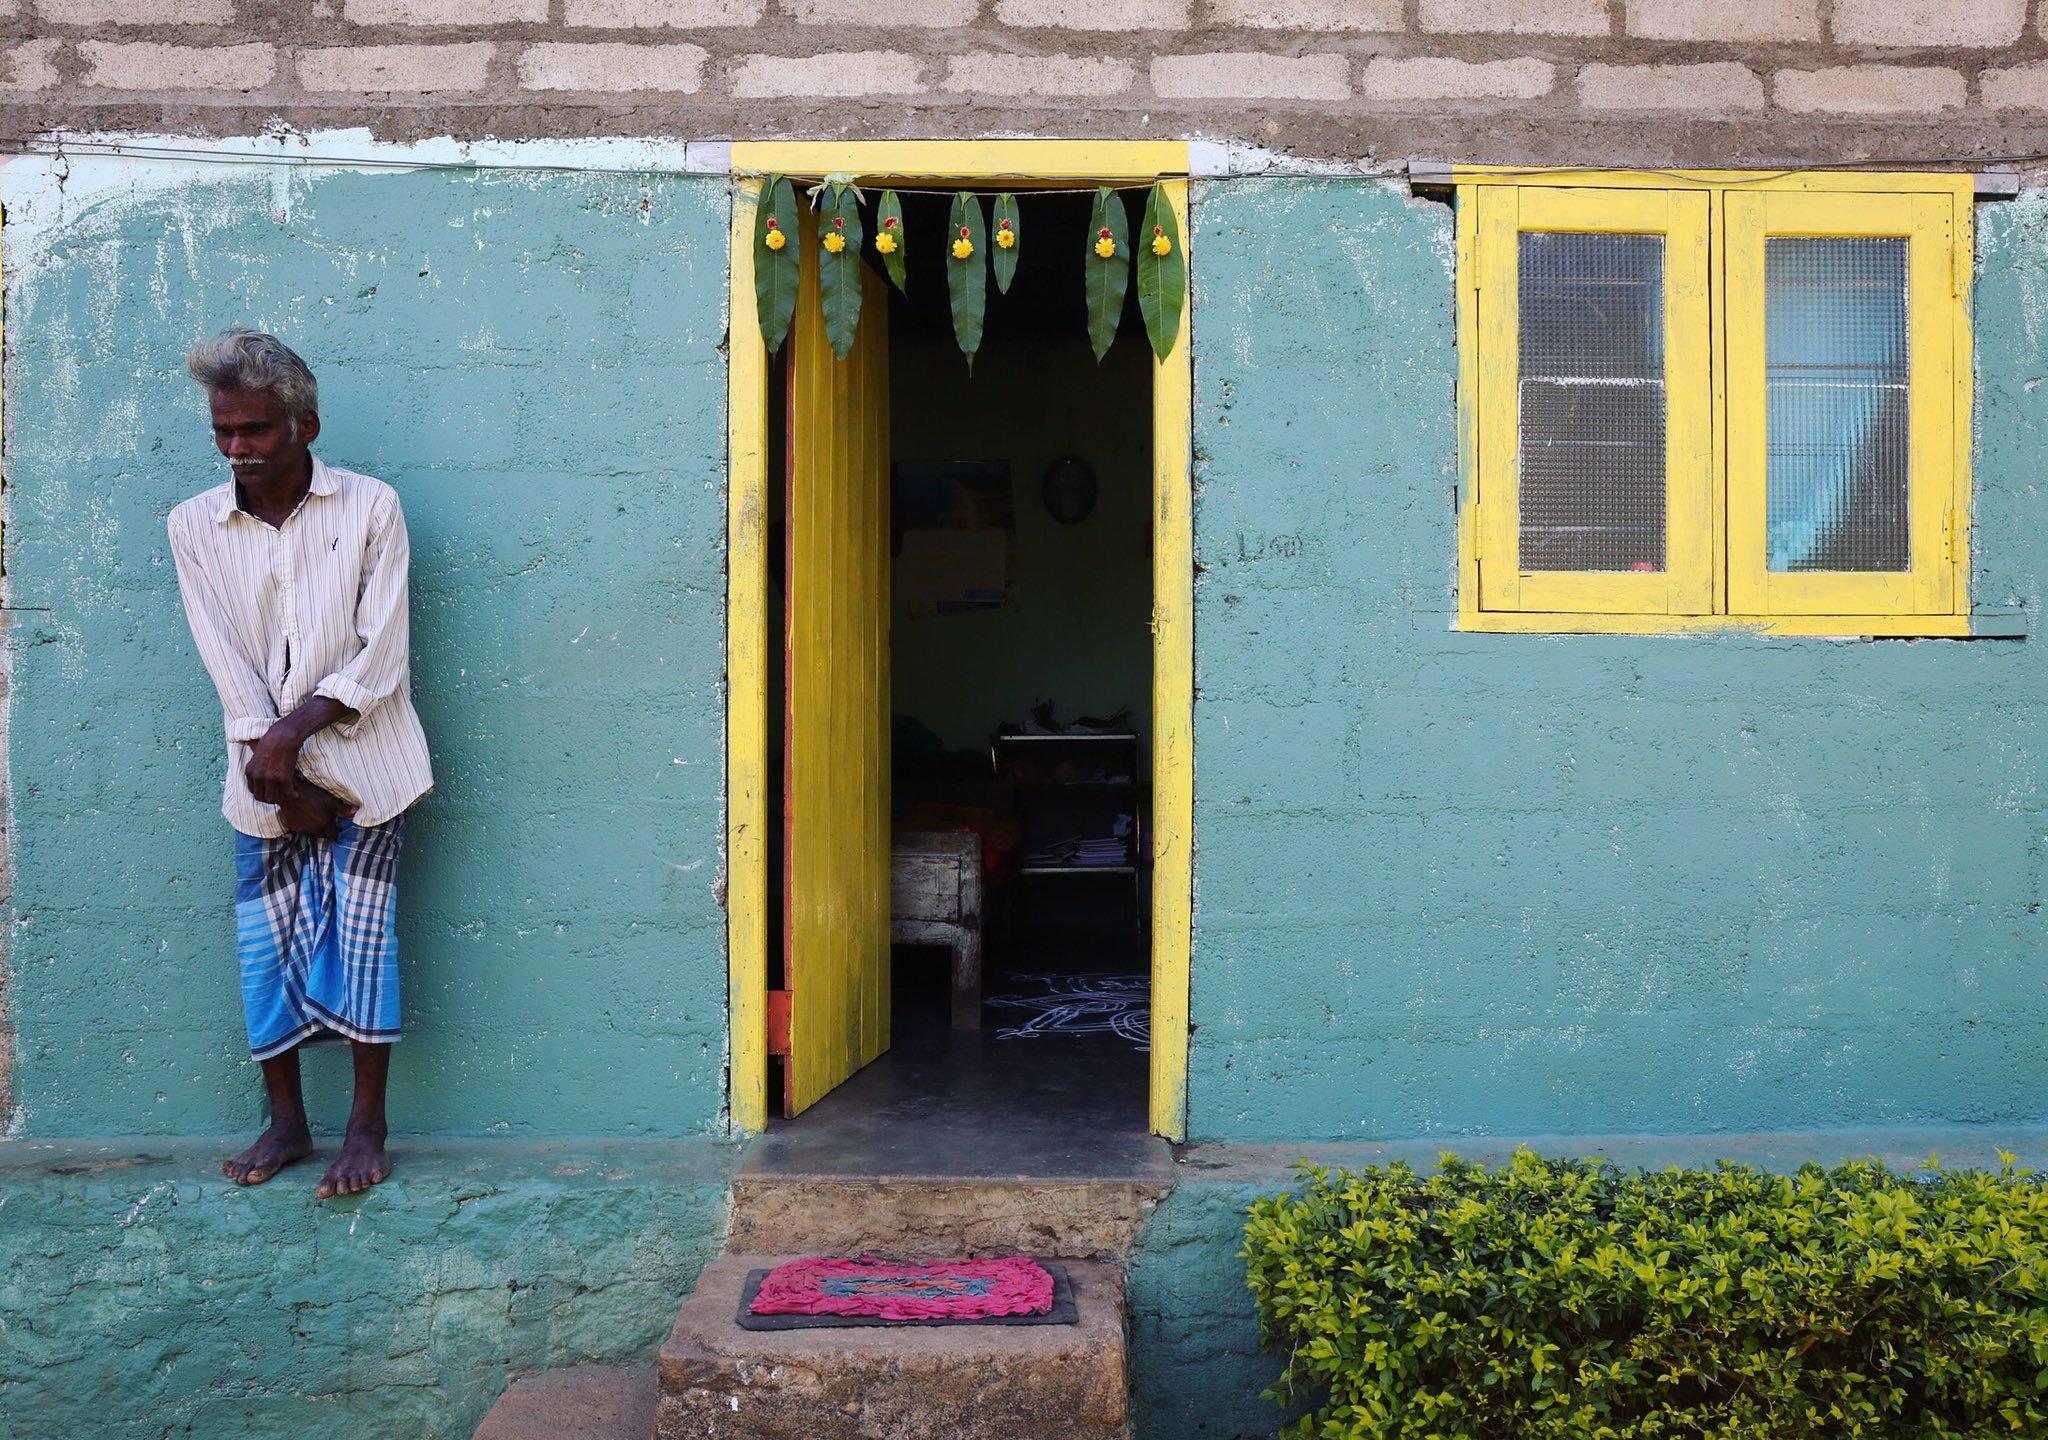 A Tamil man stands outside his home at Amba Estate. Ambadandegama Valley, Sri Lanka